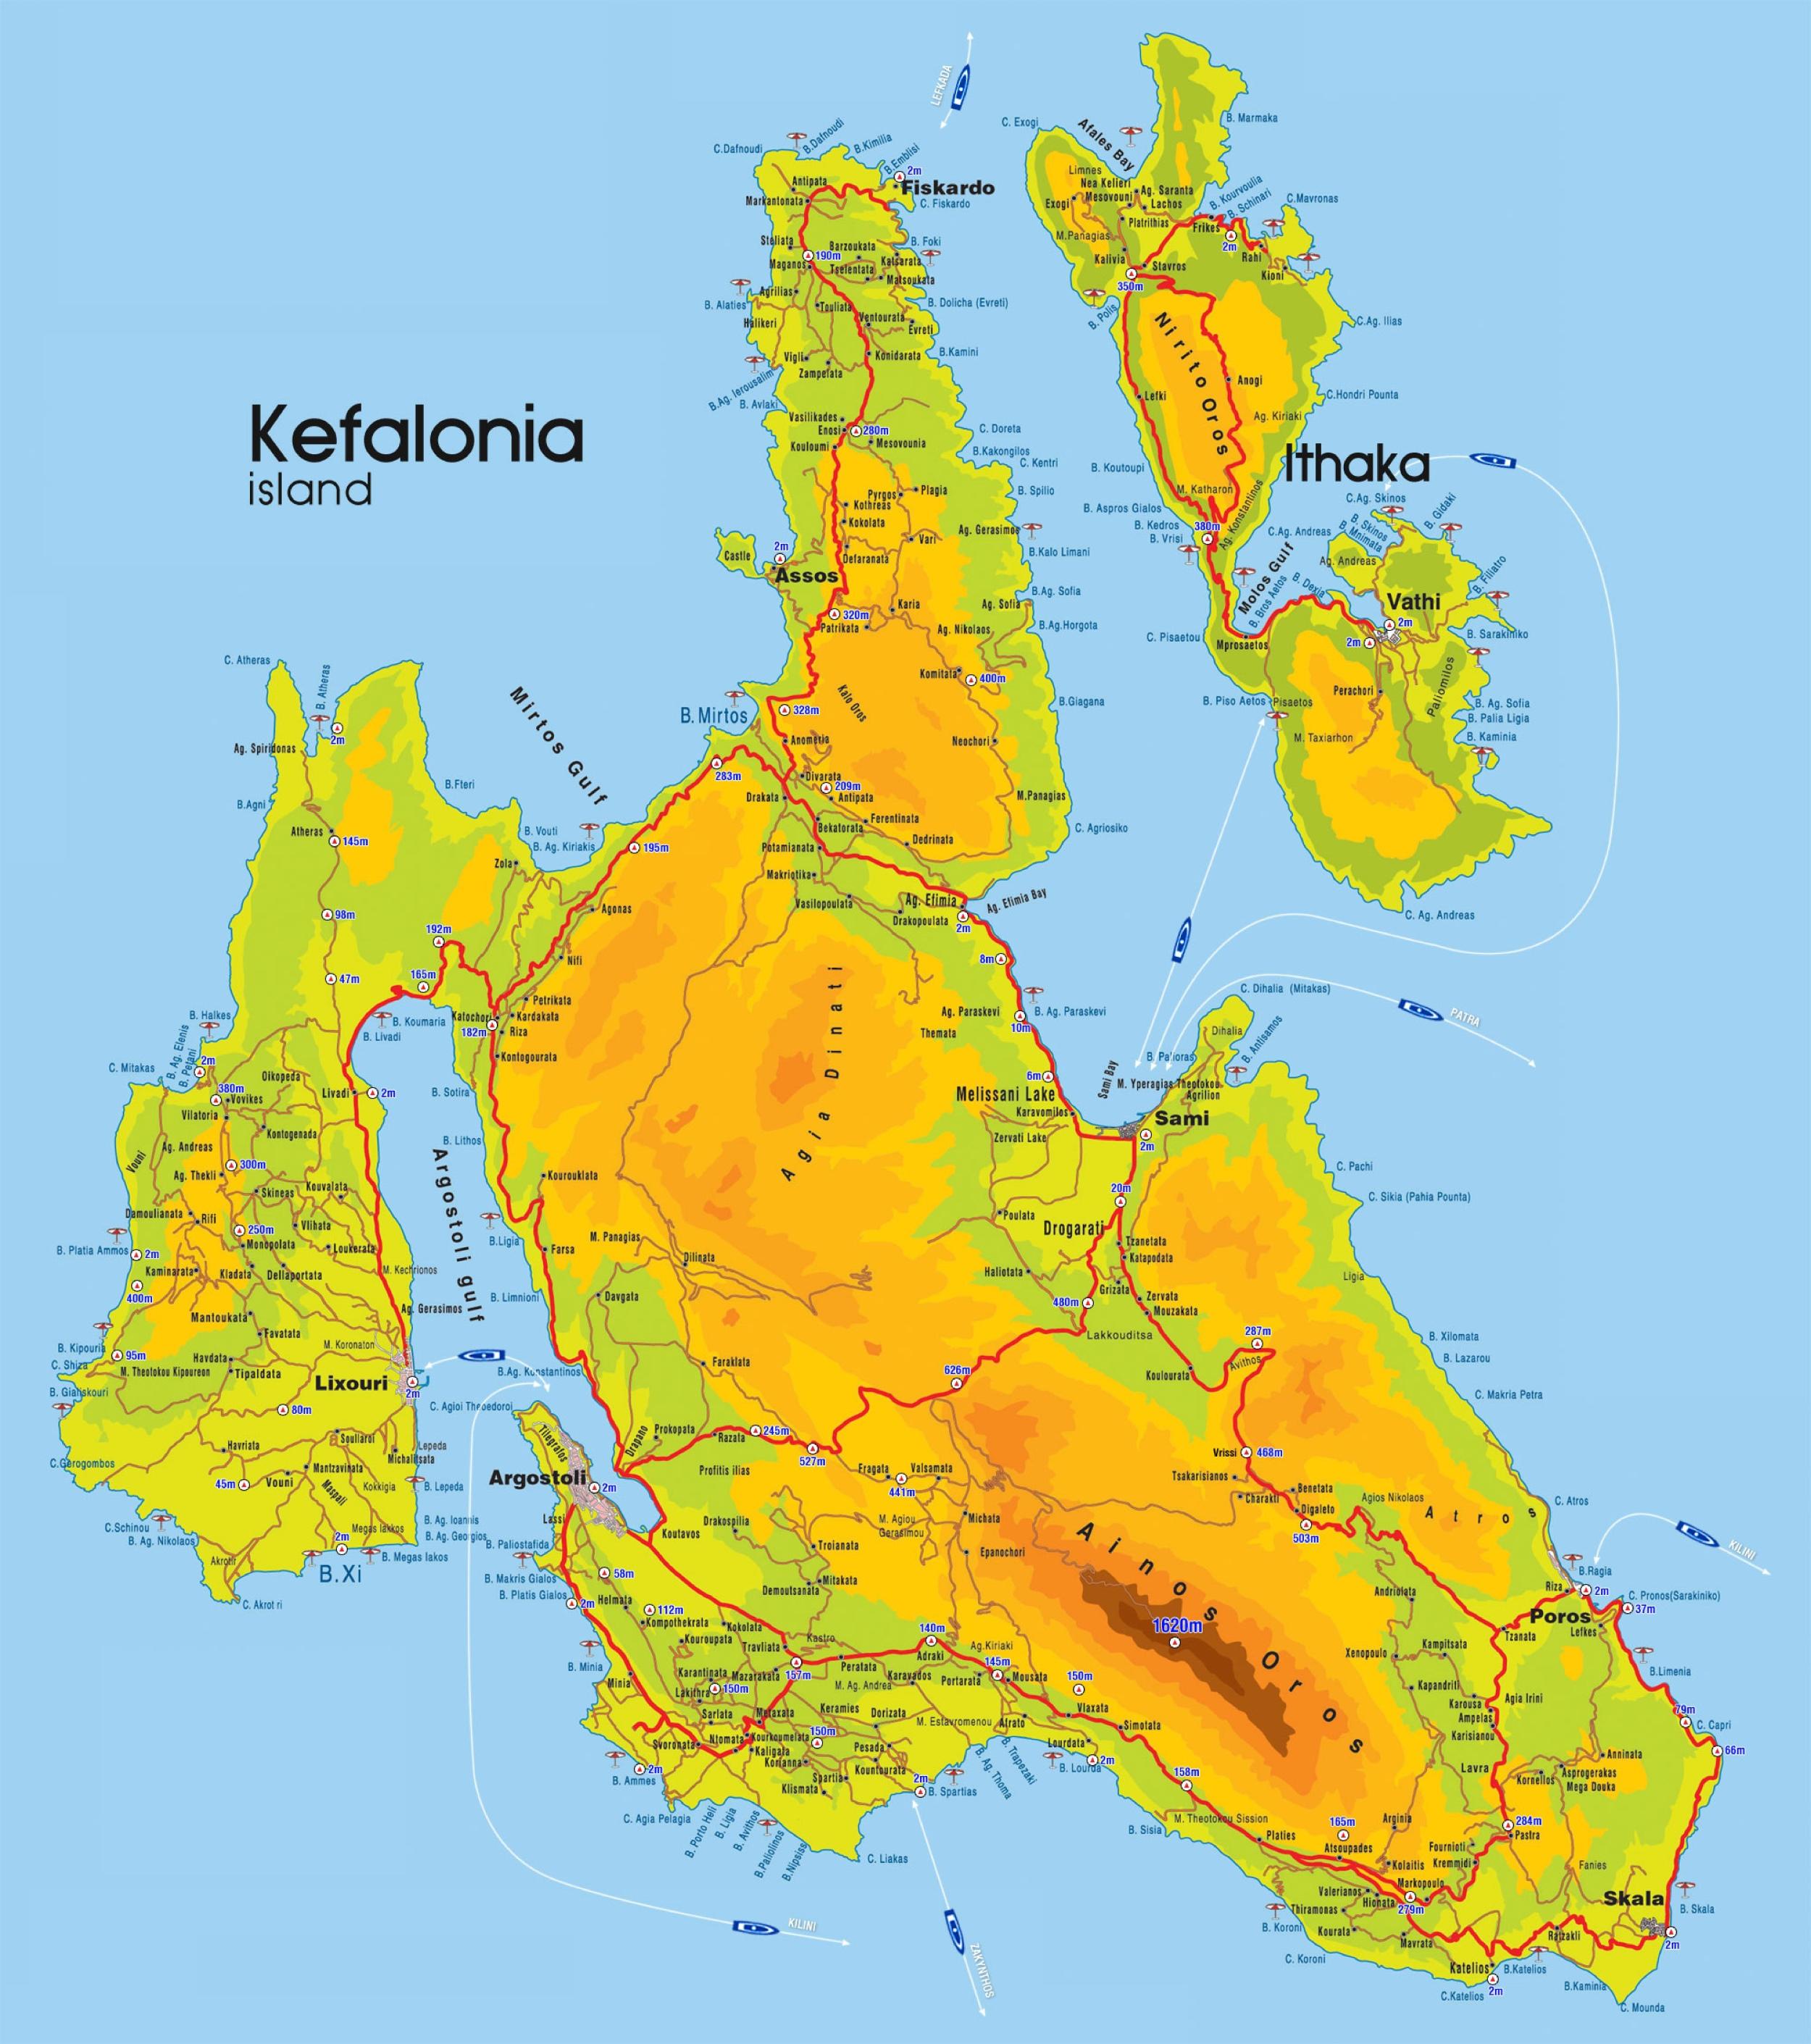 kefalonia-tourist-map.jpg